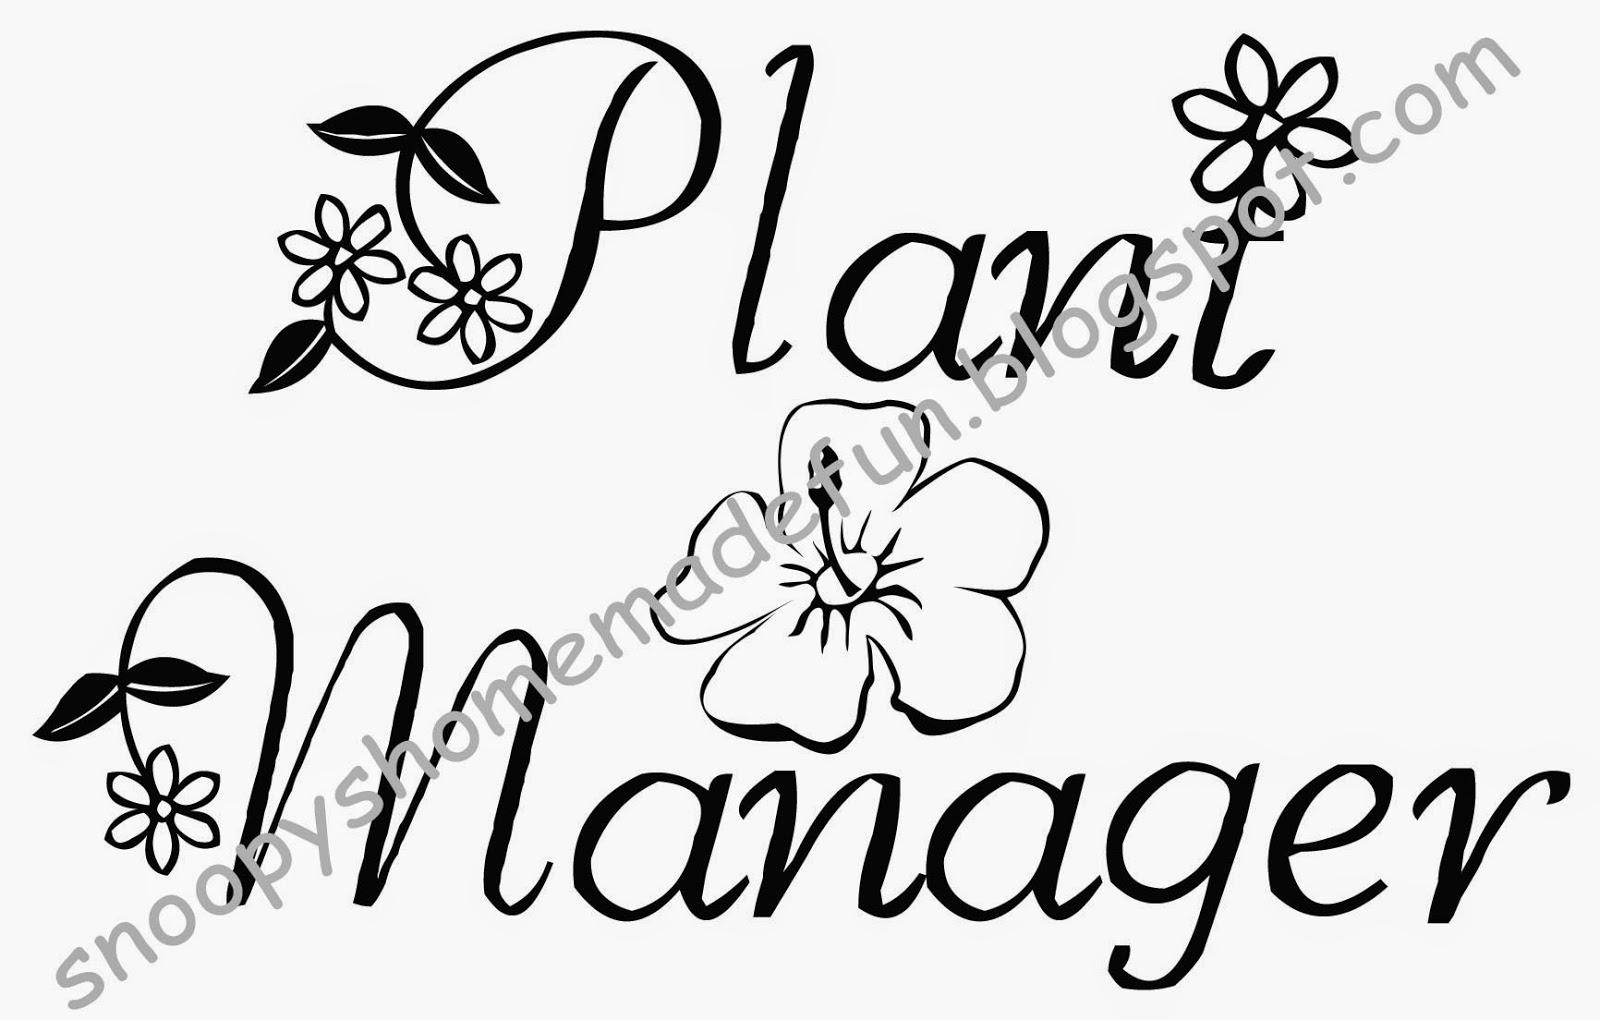 http://3.bp.blogspot.com/-HUQ1JULfWyU/Uz-d-Y7RkjI/AAAAAAAARag/L8TDseWeDKQ/s1600/SHF+Plant+Manager+watermarked.jpg